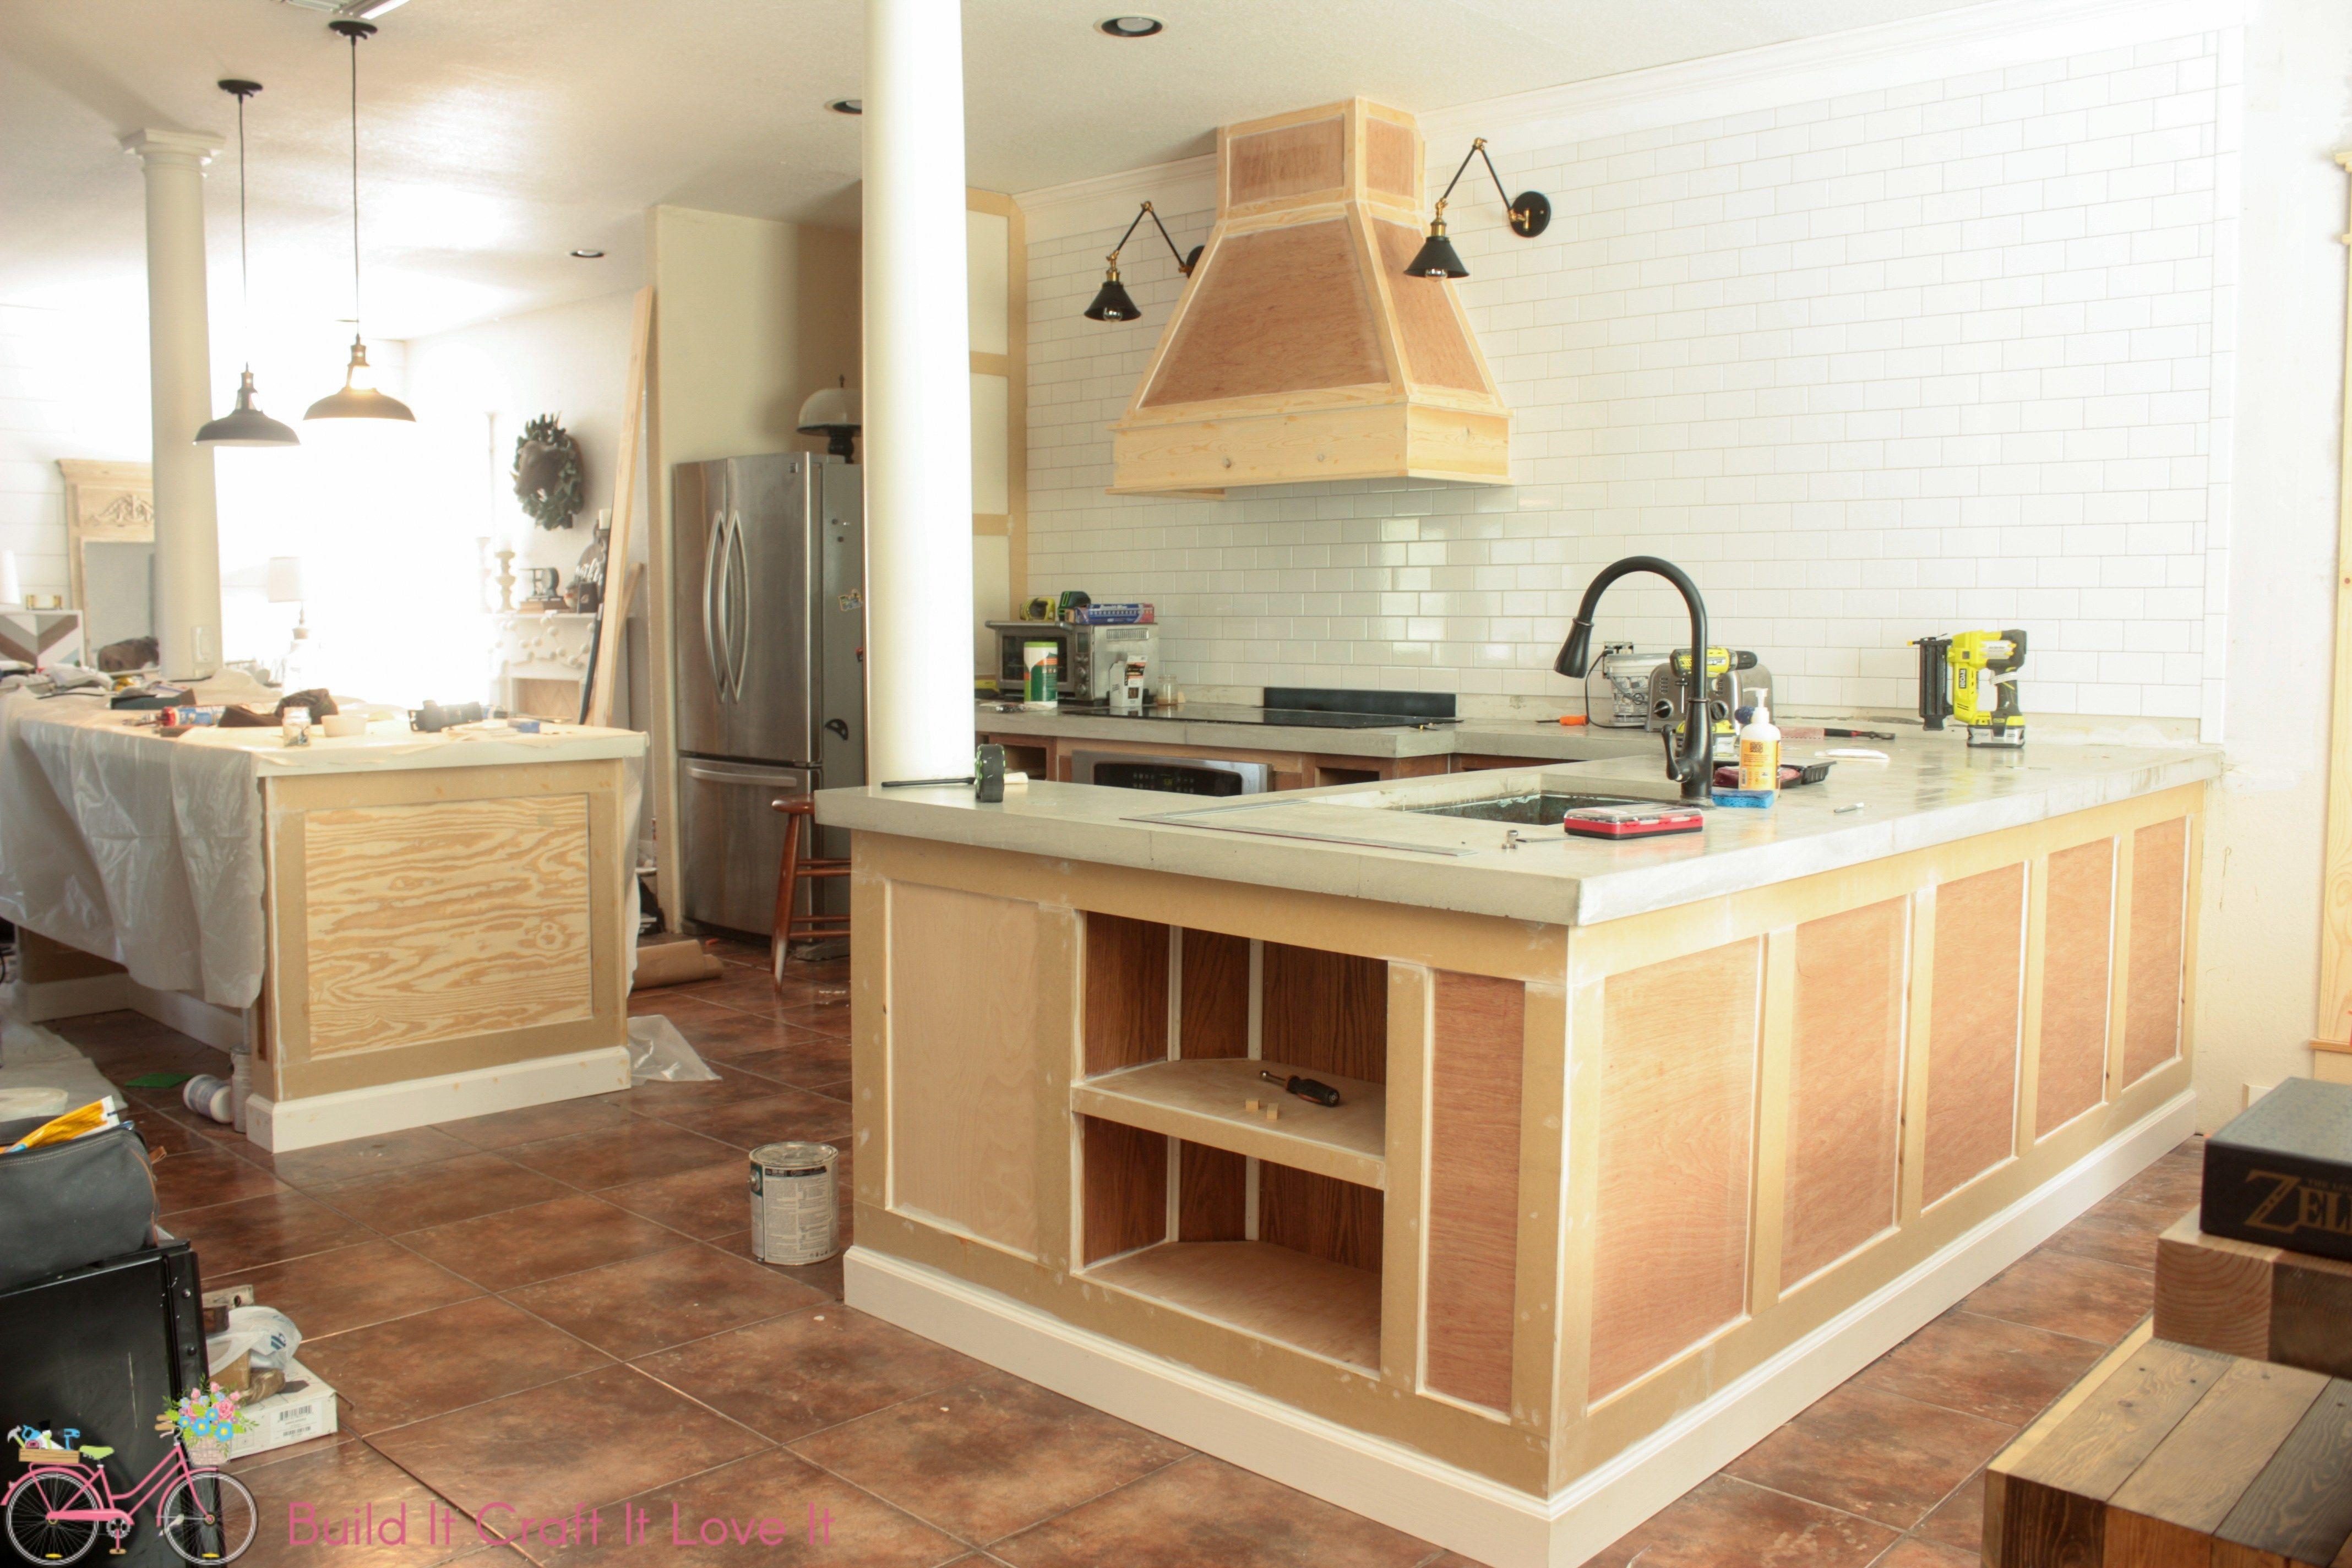 Diy vent hood plans and kitchen update kitchen hood